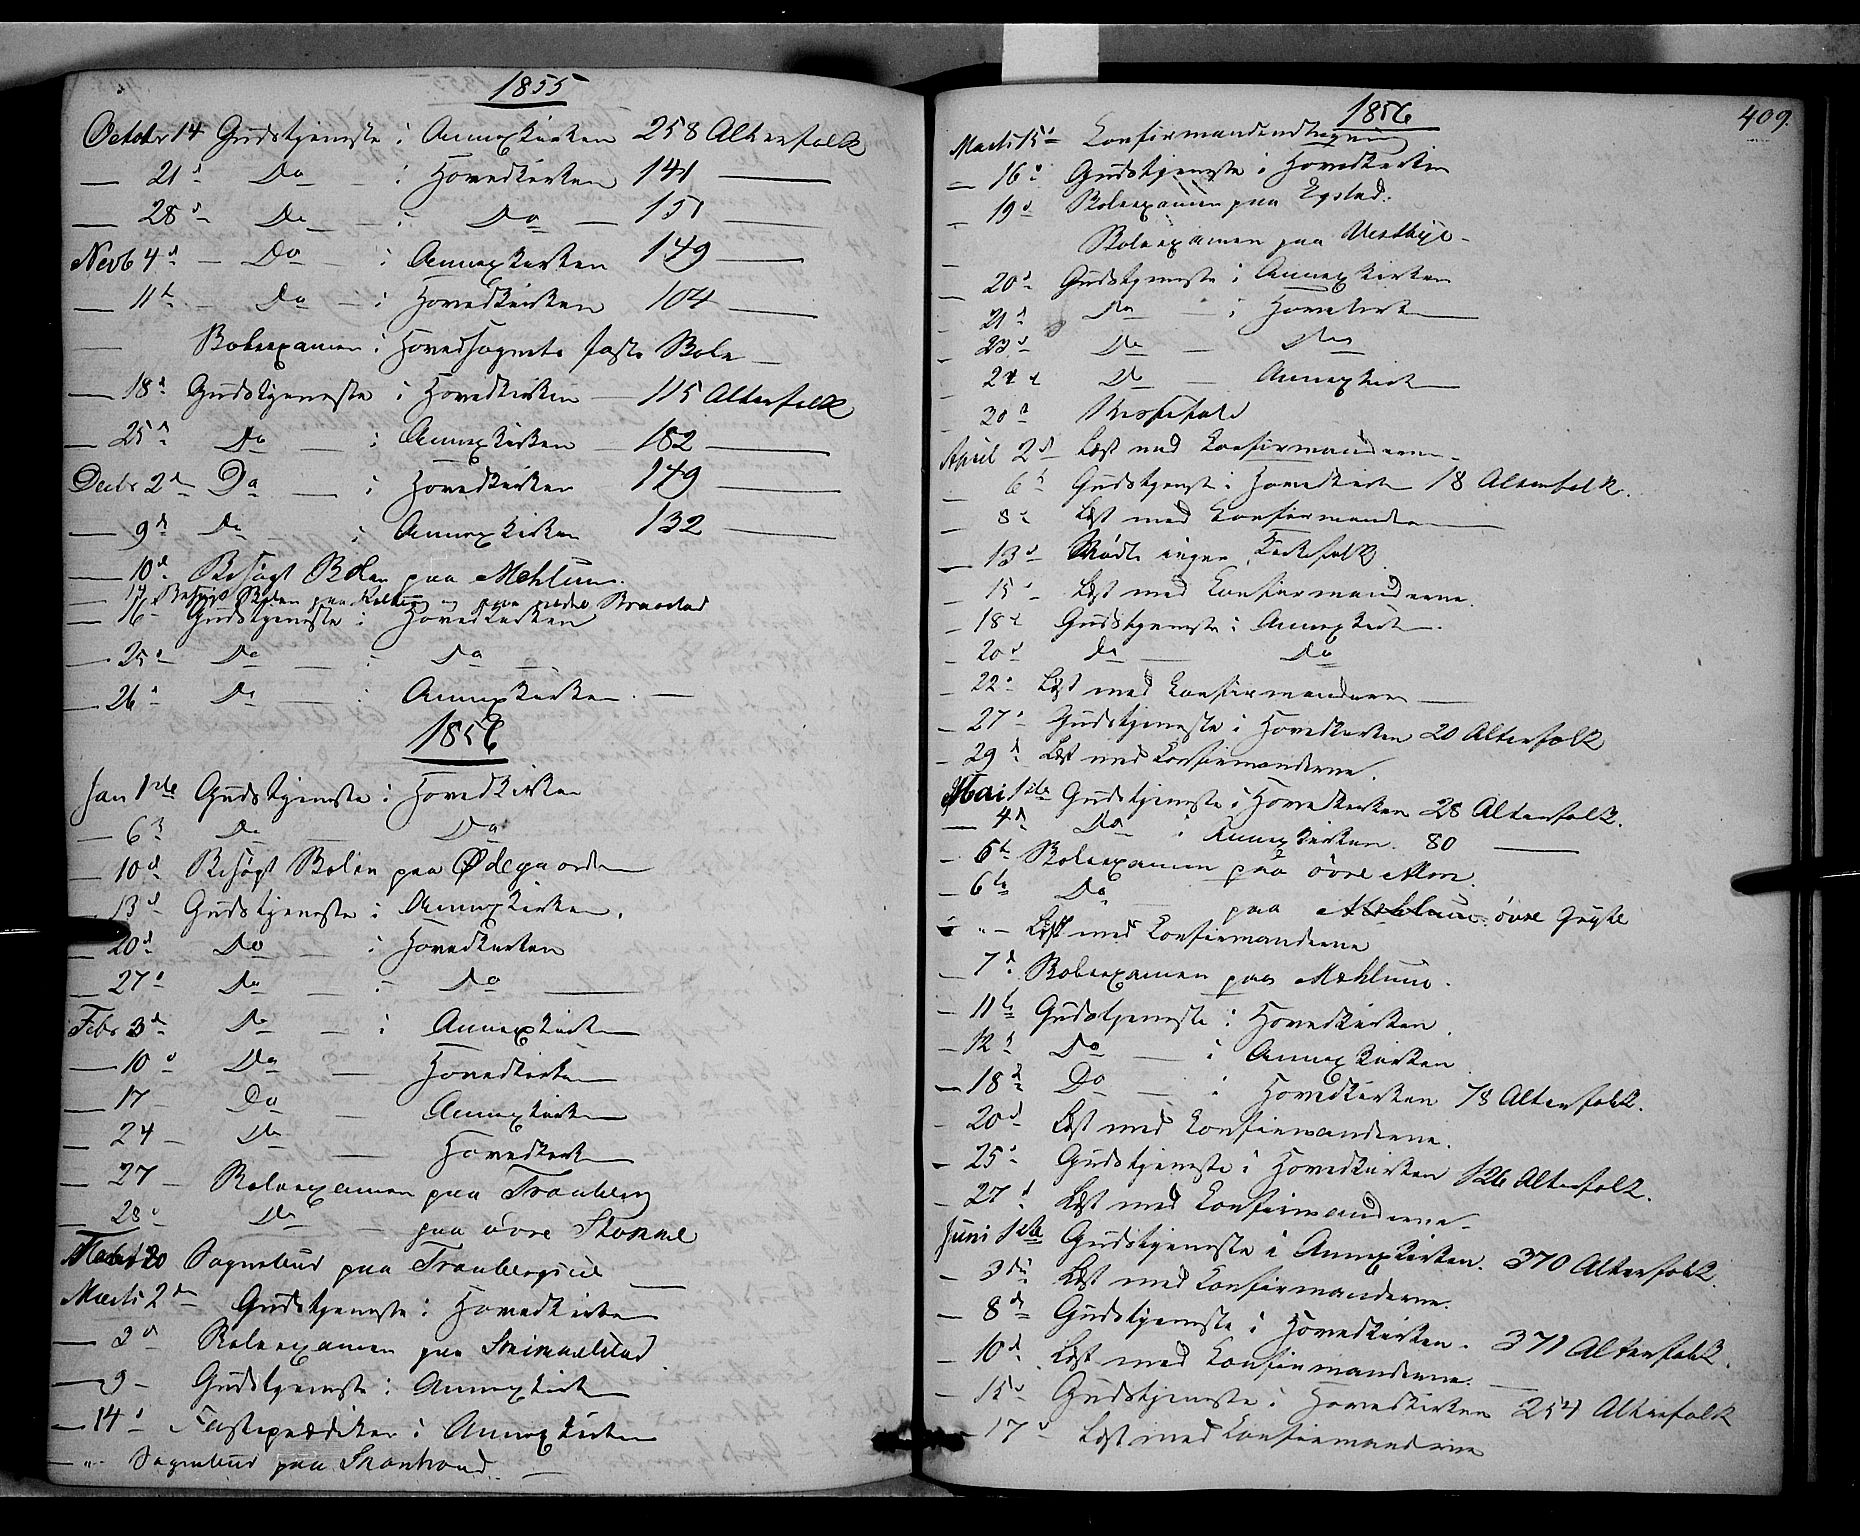 SAH, Vardal prestekontor, H/Ha/Haa/L0006: Ministerialbok nr. 6, 1854-1866, s. 409